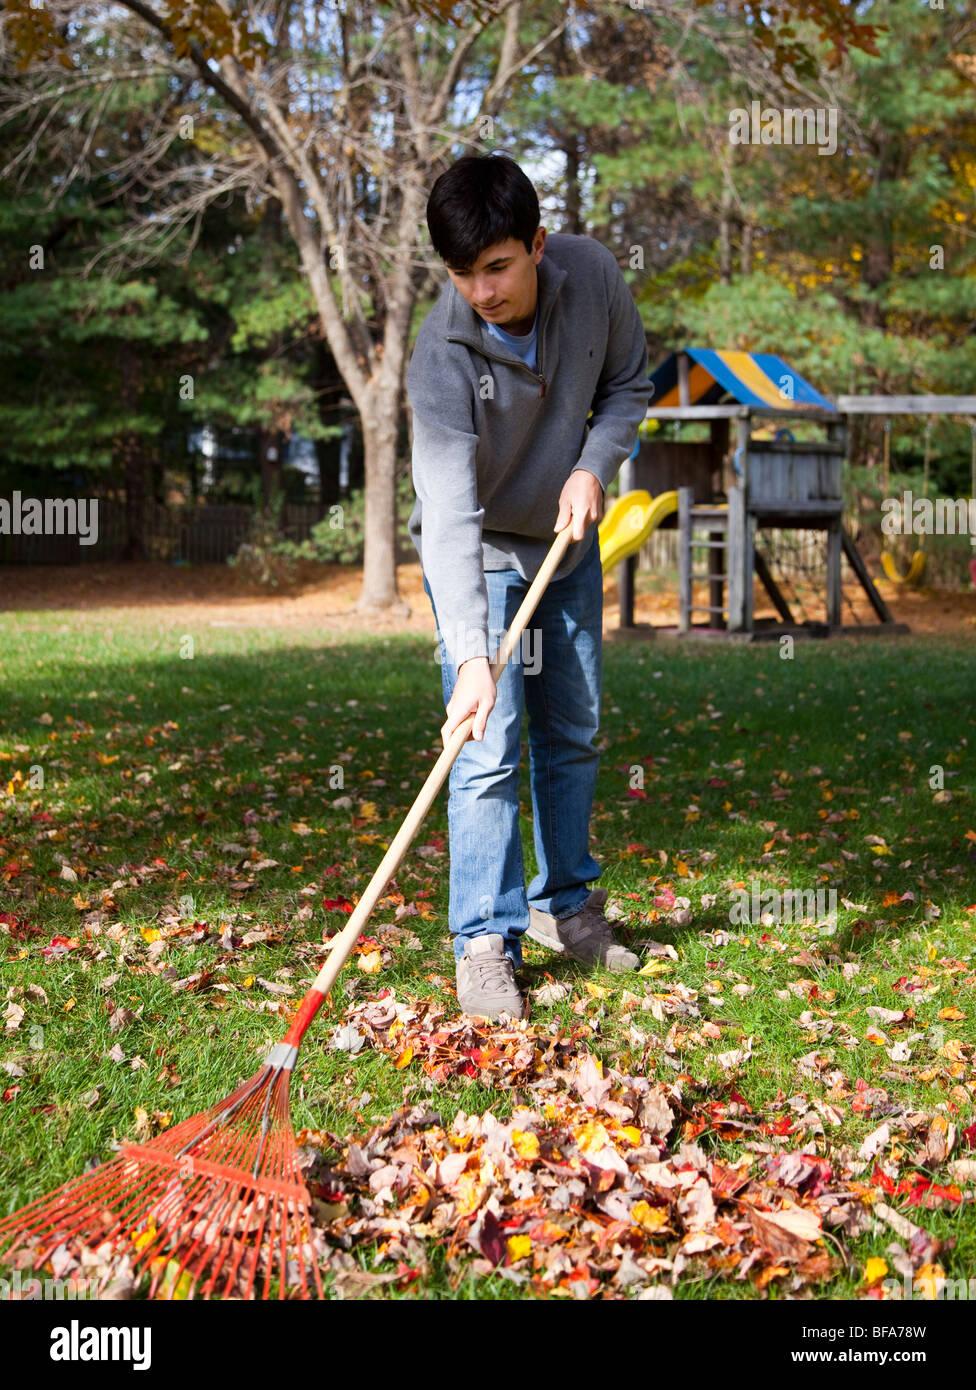 teenage boy raking leaves stock photo royalty free image 26655465 alamy. Black Bedroom Furniture Sets. Home Design Ideas